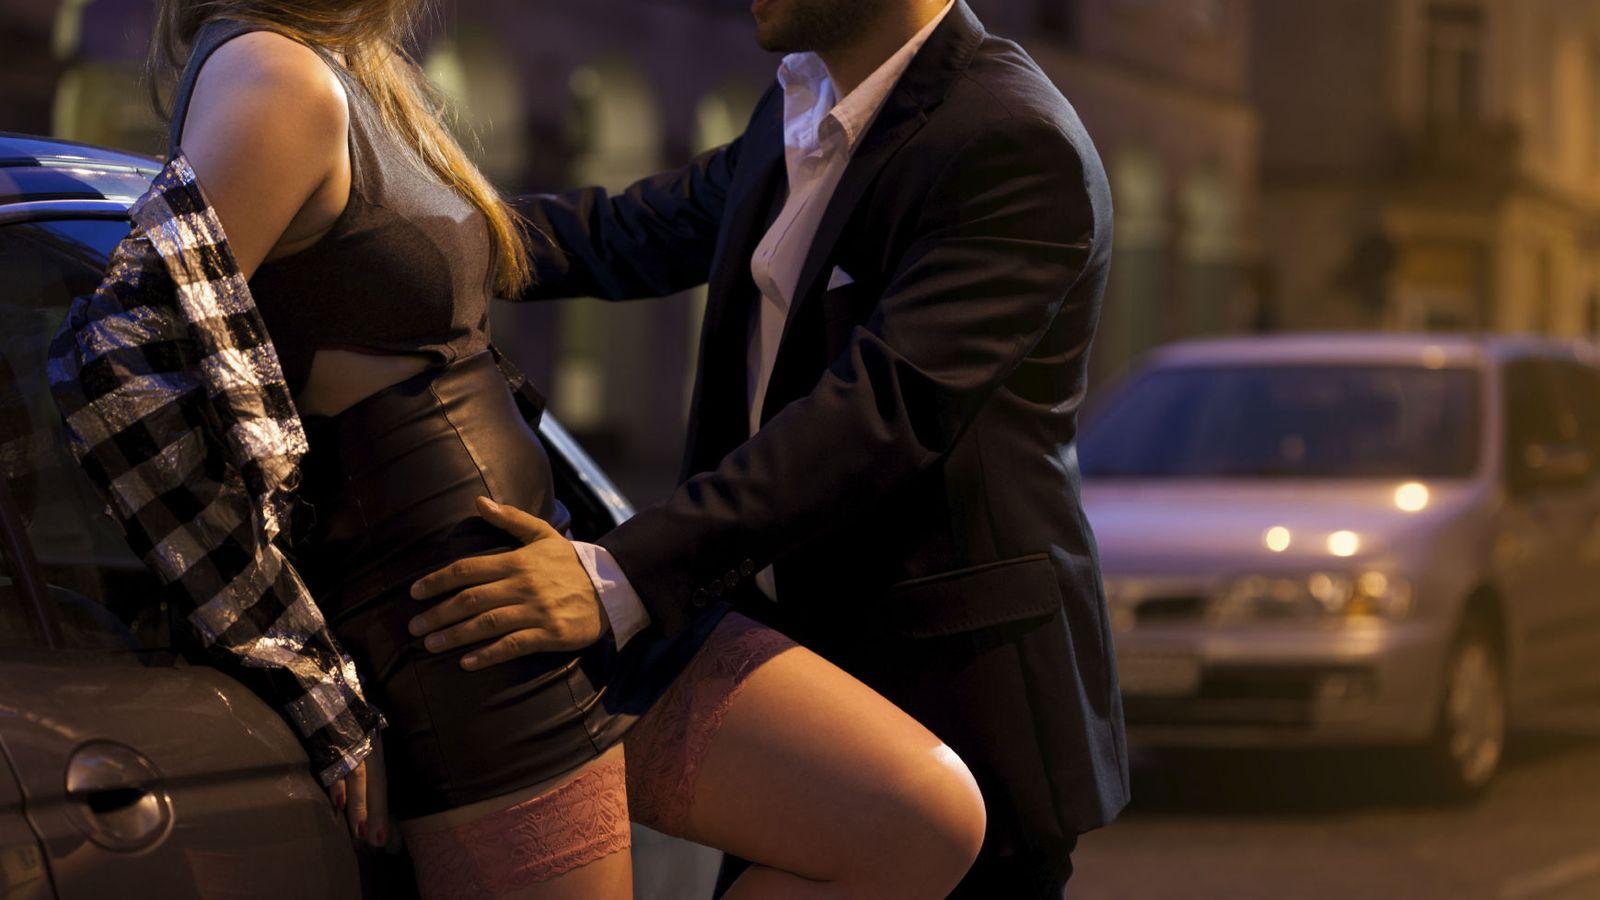 monjas se hacen pasar por prostitutas adolescentes con prostitutas